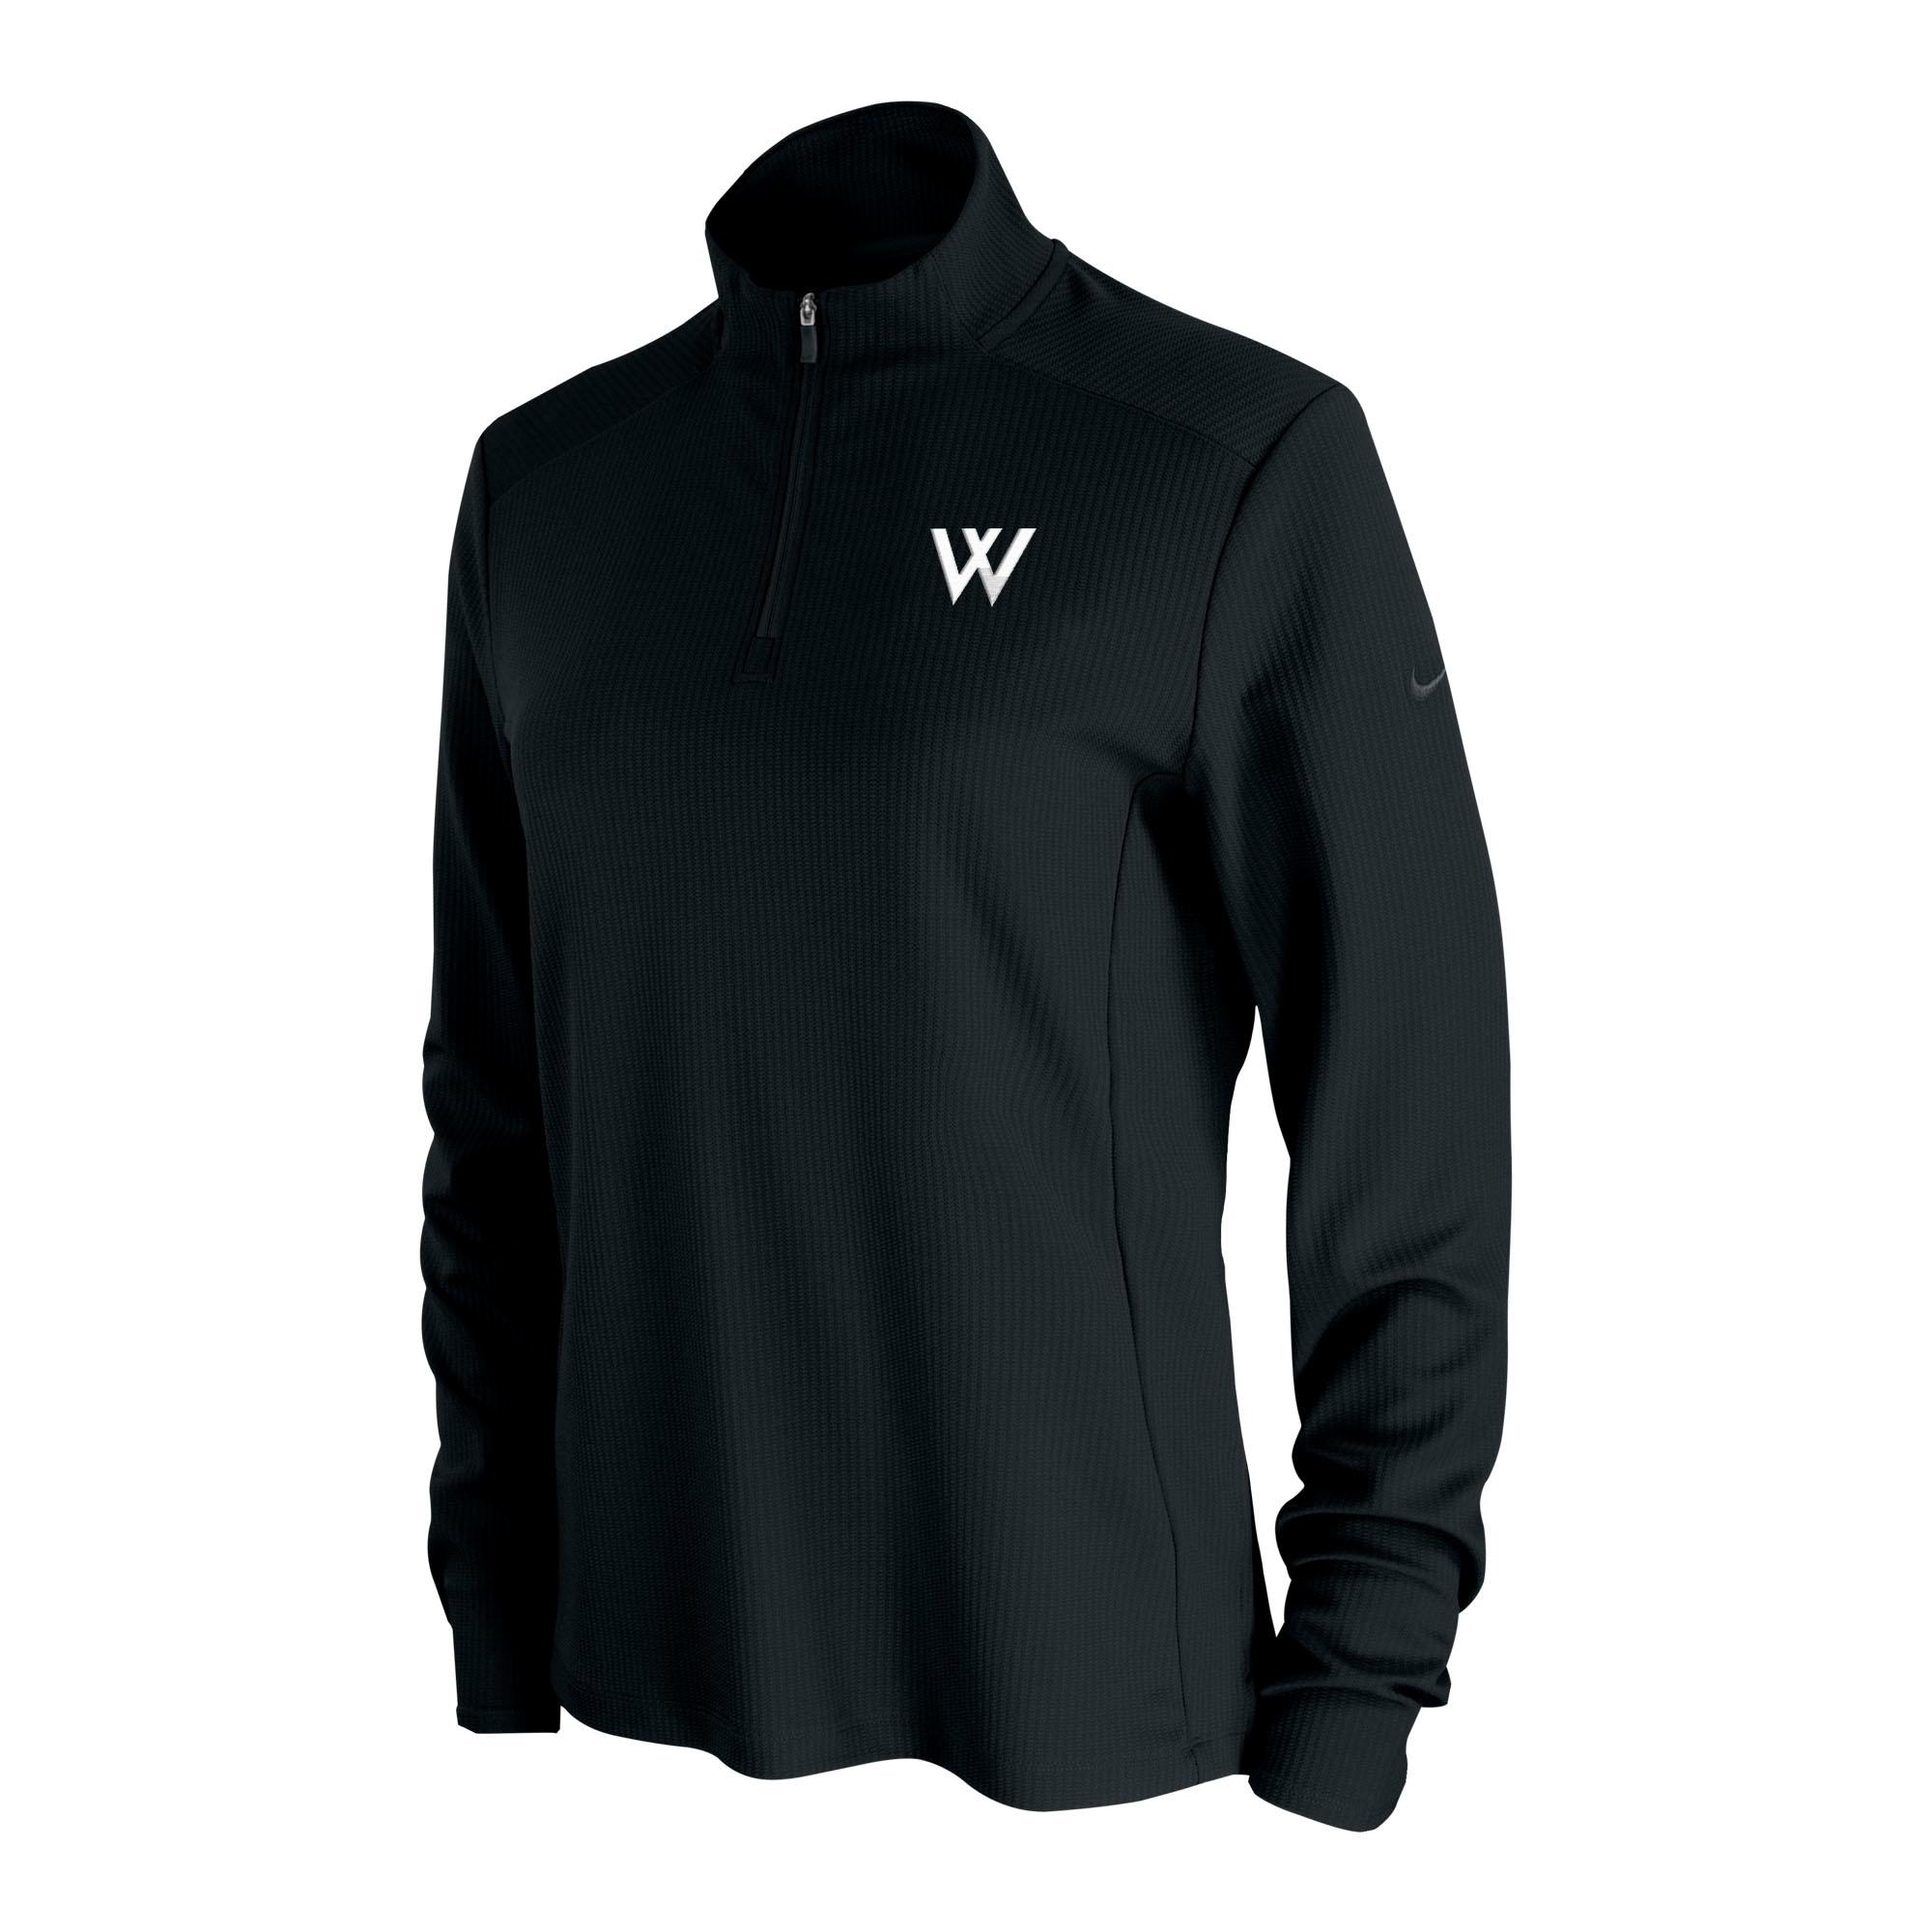 Nike Pullover: Nike Women's UV Victory 1/4 Zip - Black